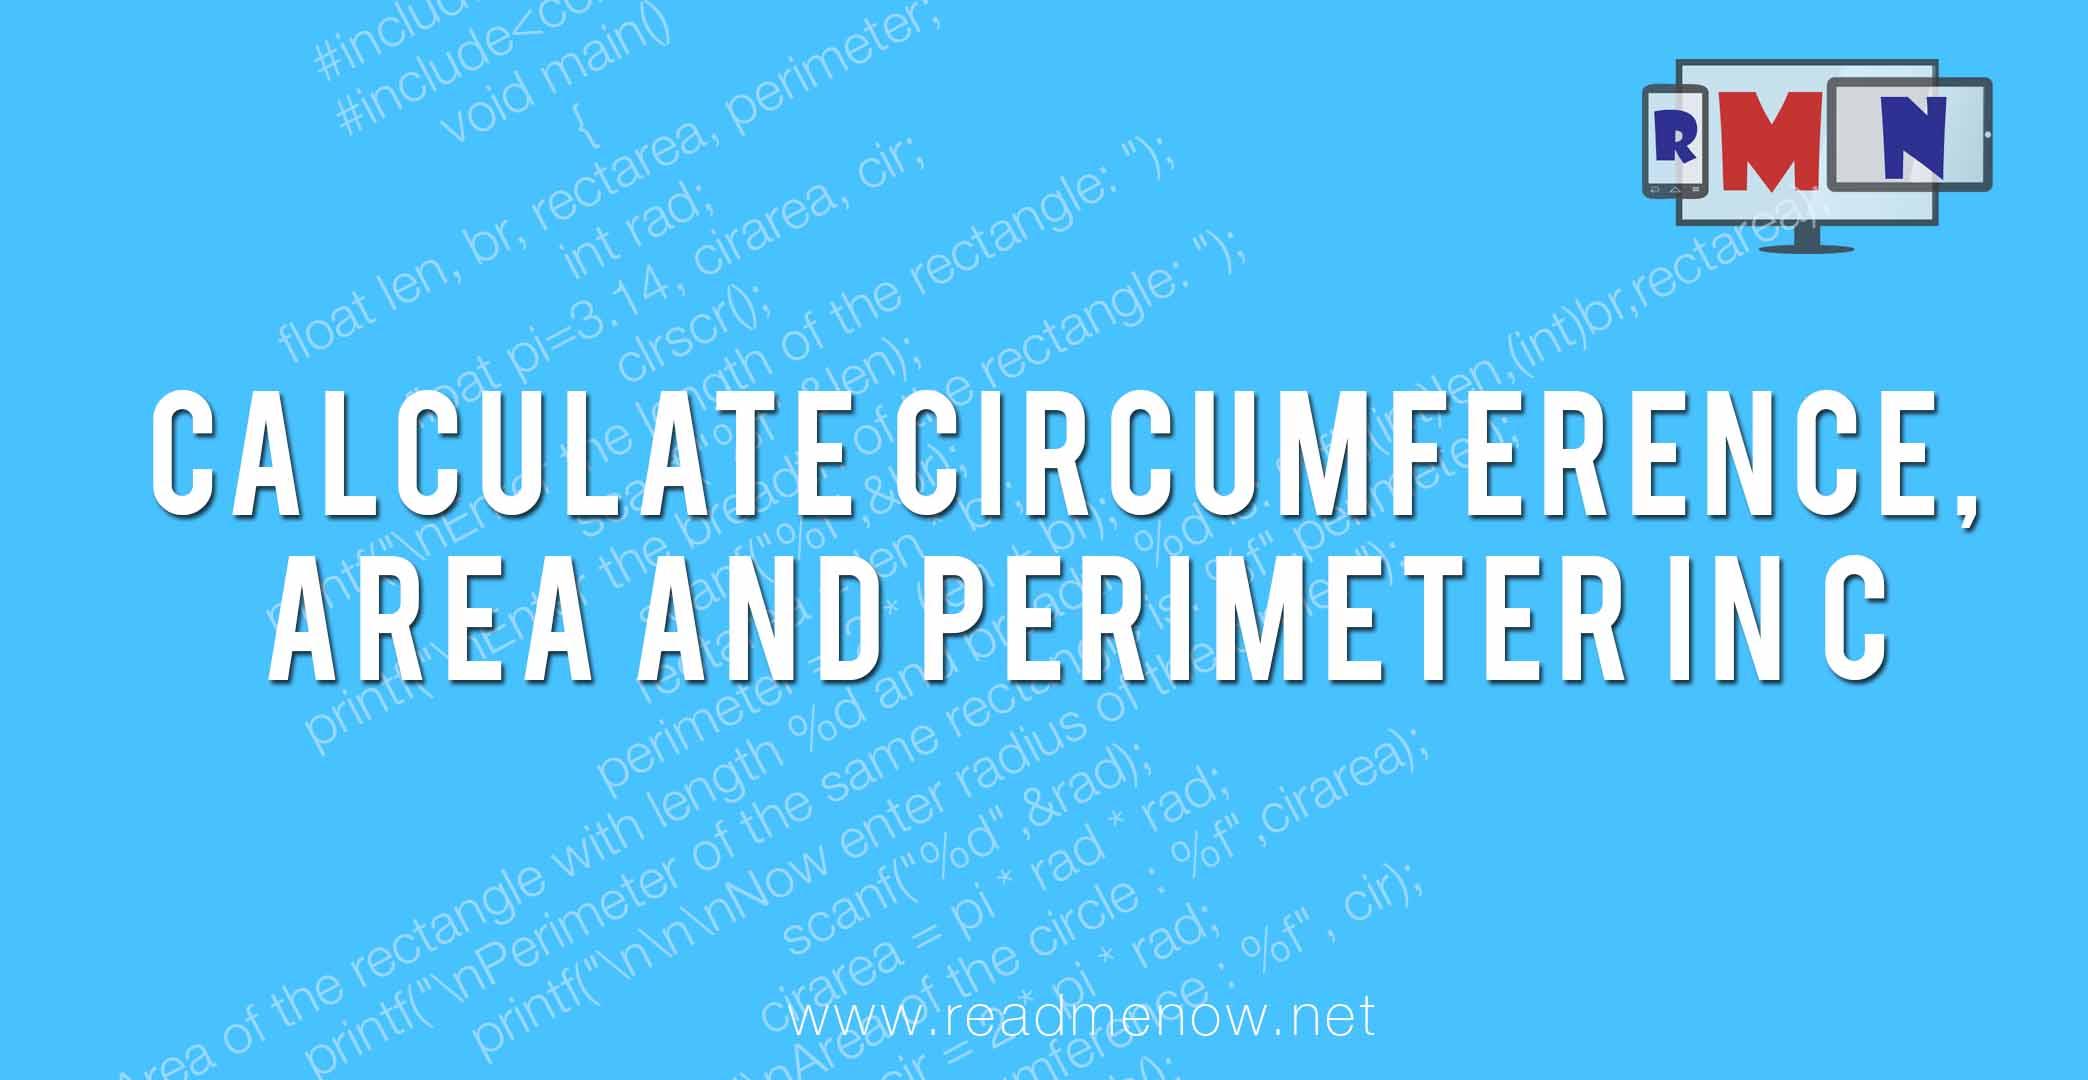 Calculate Circumference Area And Perimeter In C